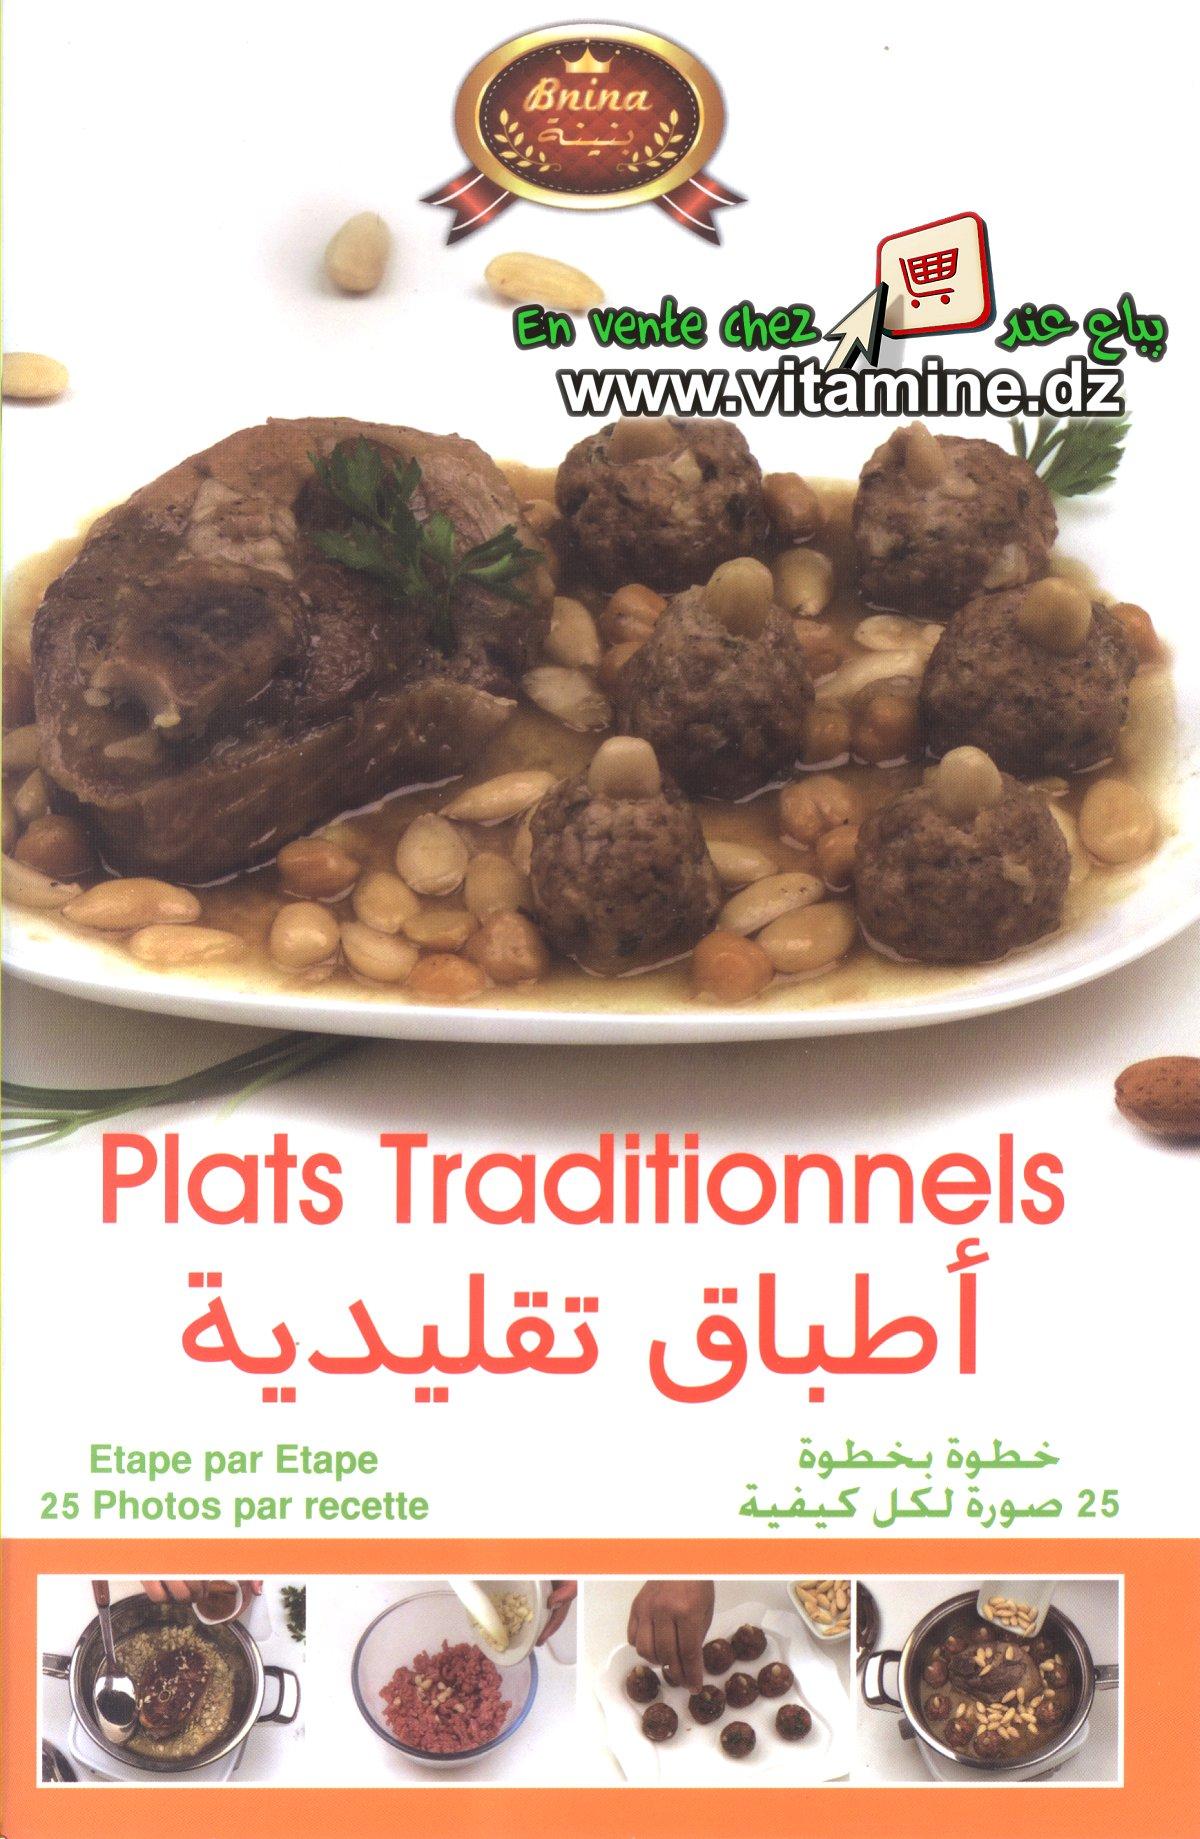 Bnina - Plats traditionnels